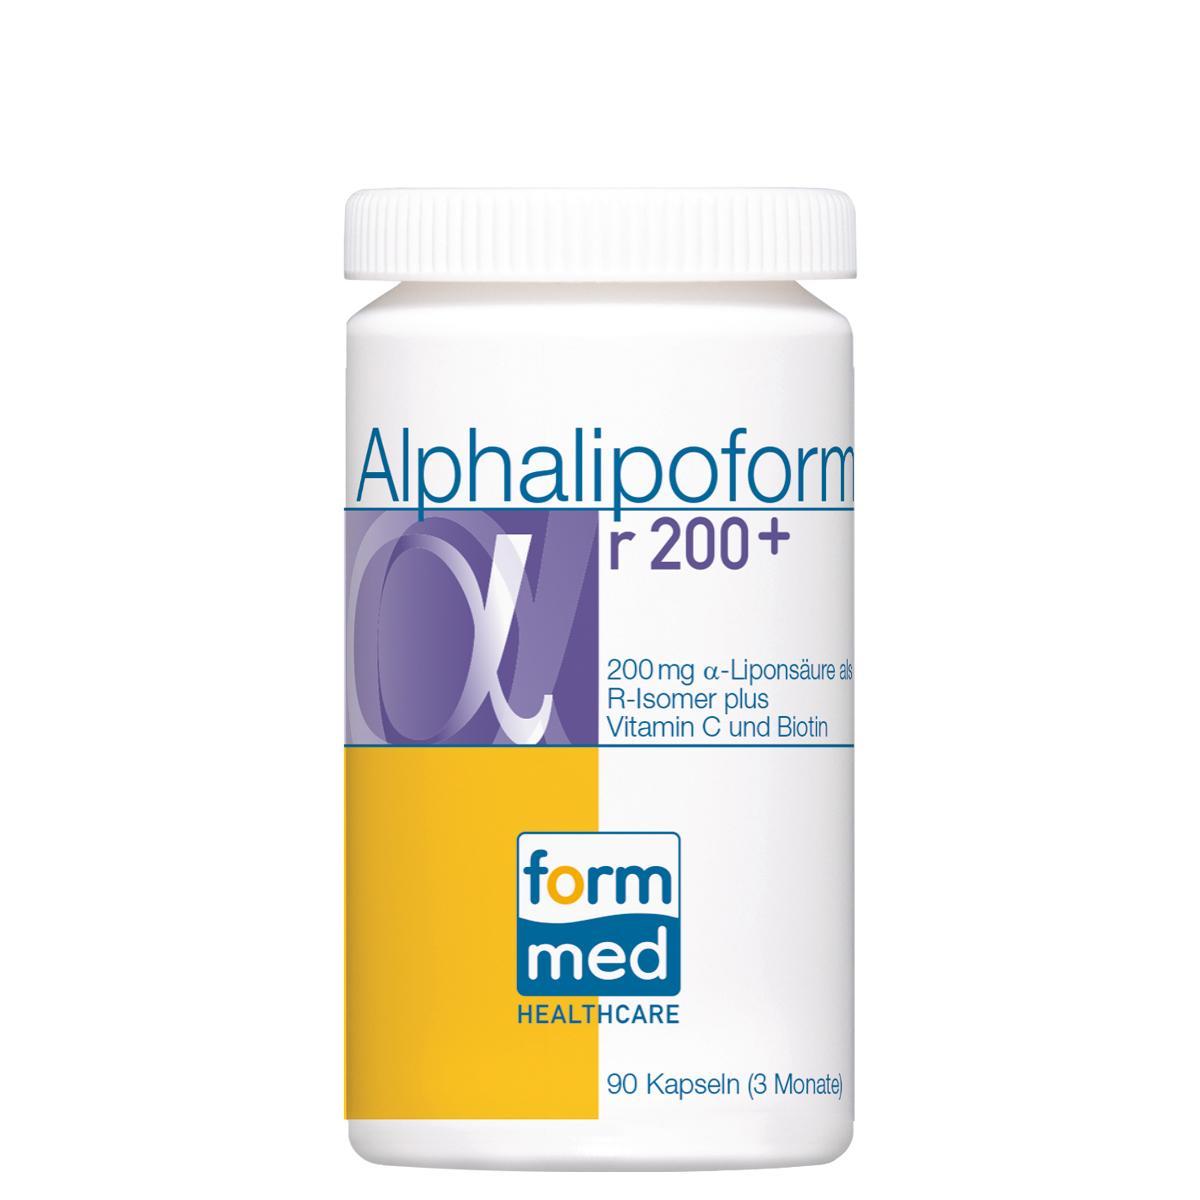 Alphalipoform r 200+